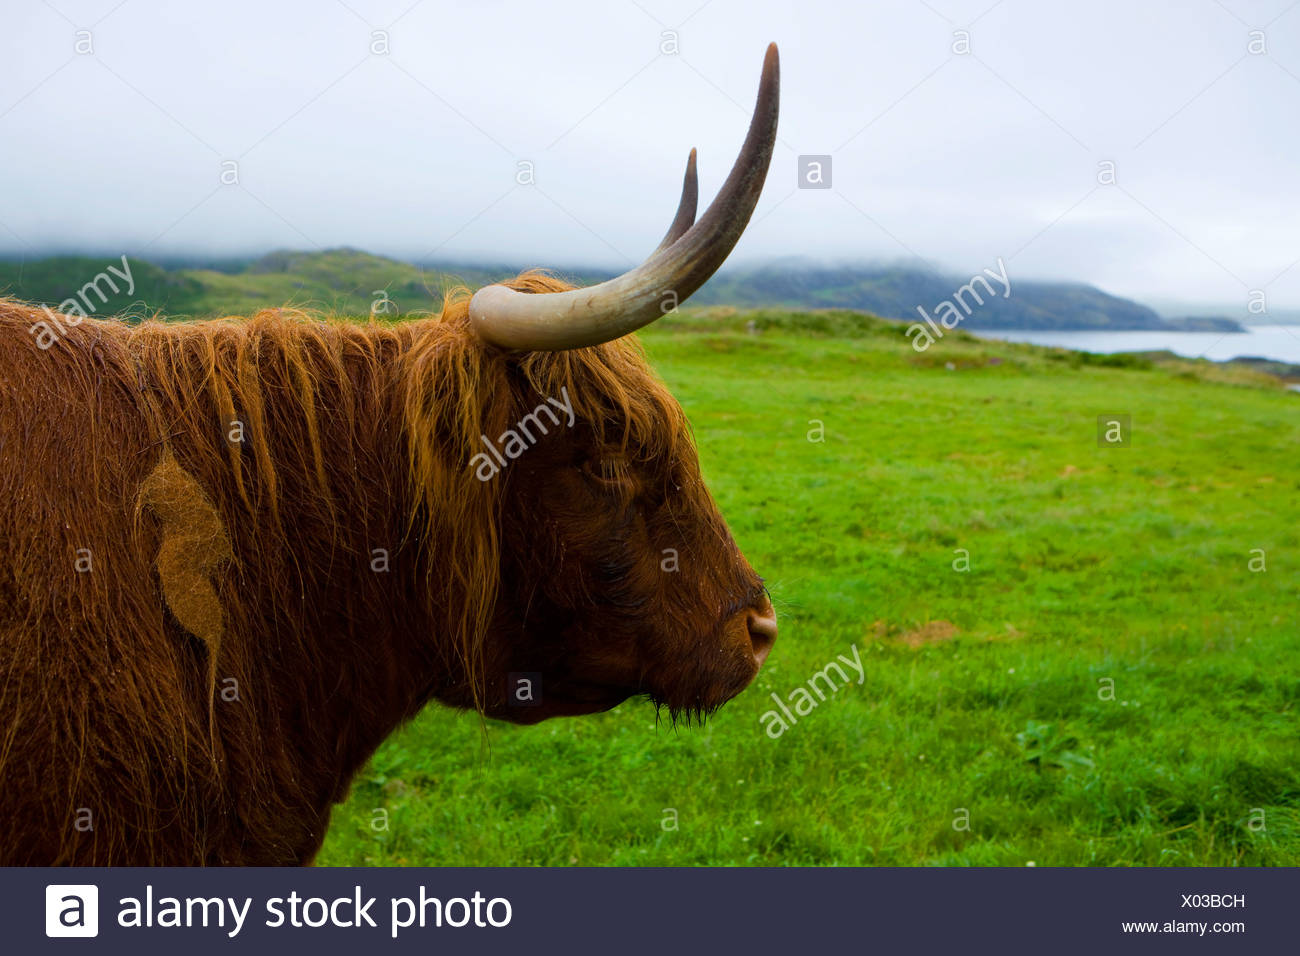 Scourie, highland bovine animal, Great Britain, Scotland, Europe, mammal, domestic animal, pet, Scottish highland bovine animal, - Stock Image